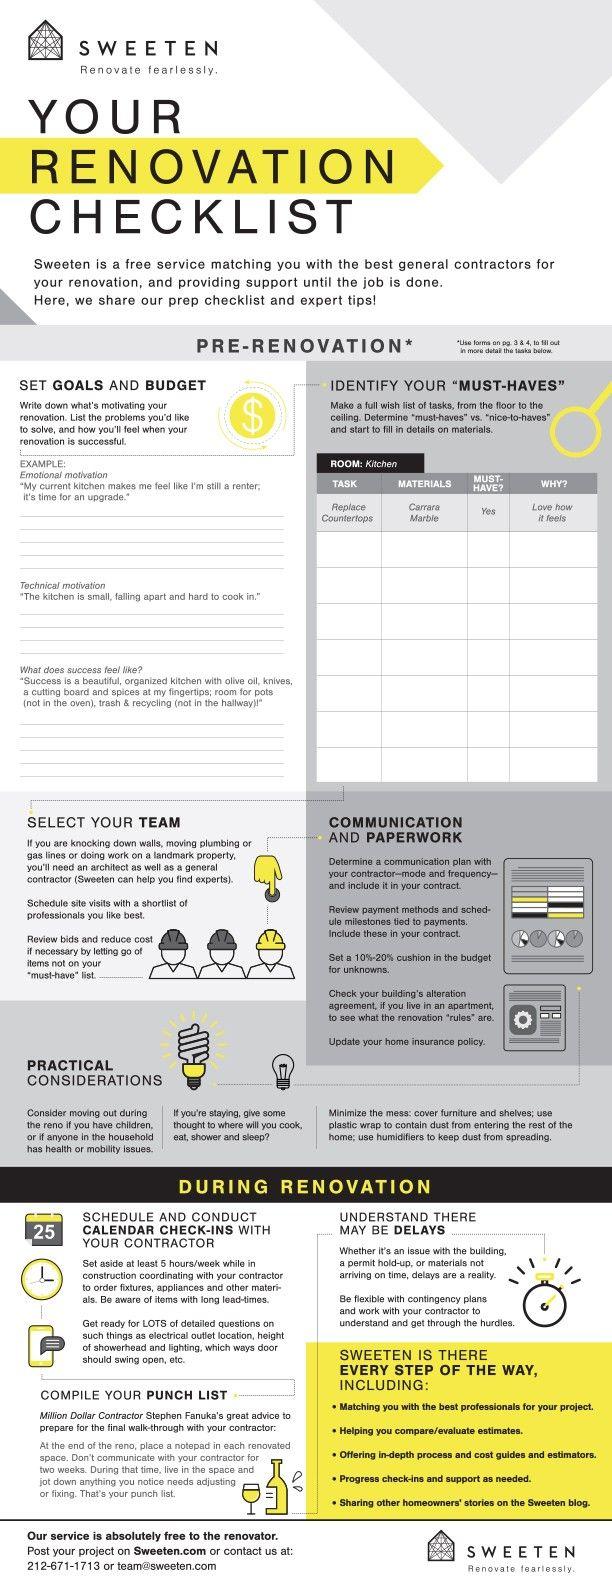 A Renovation Checklist In 2020 Renovation Planner Renovations Checklist Nj home improvement contract template